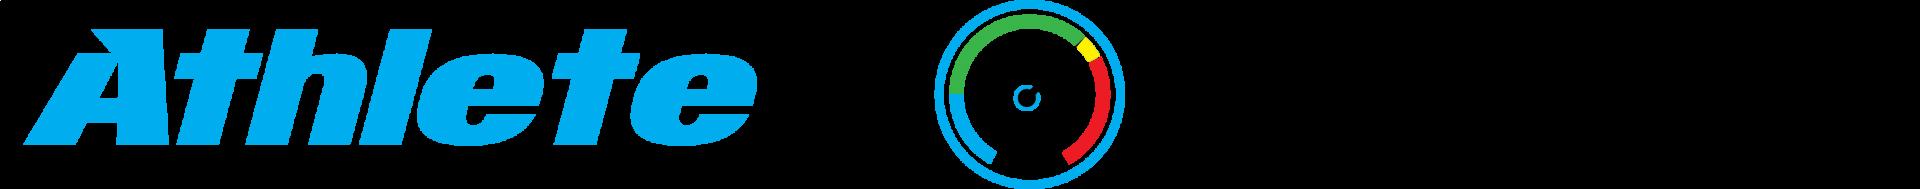 Image result for athletemonitoring logo